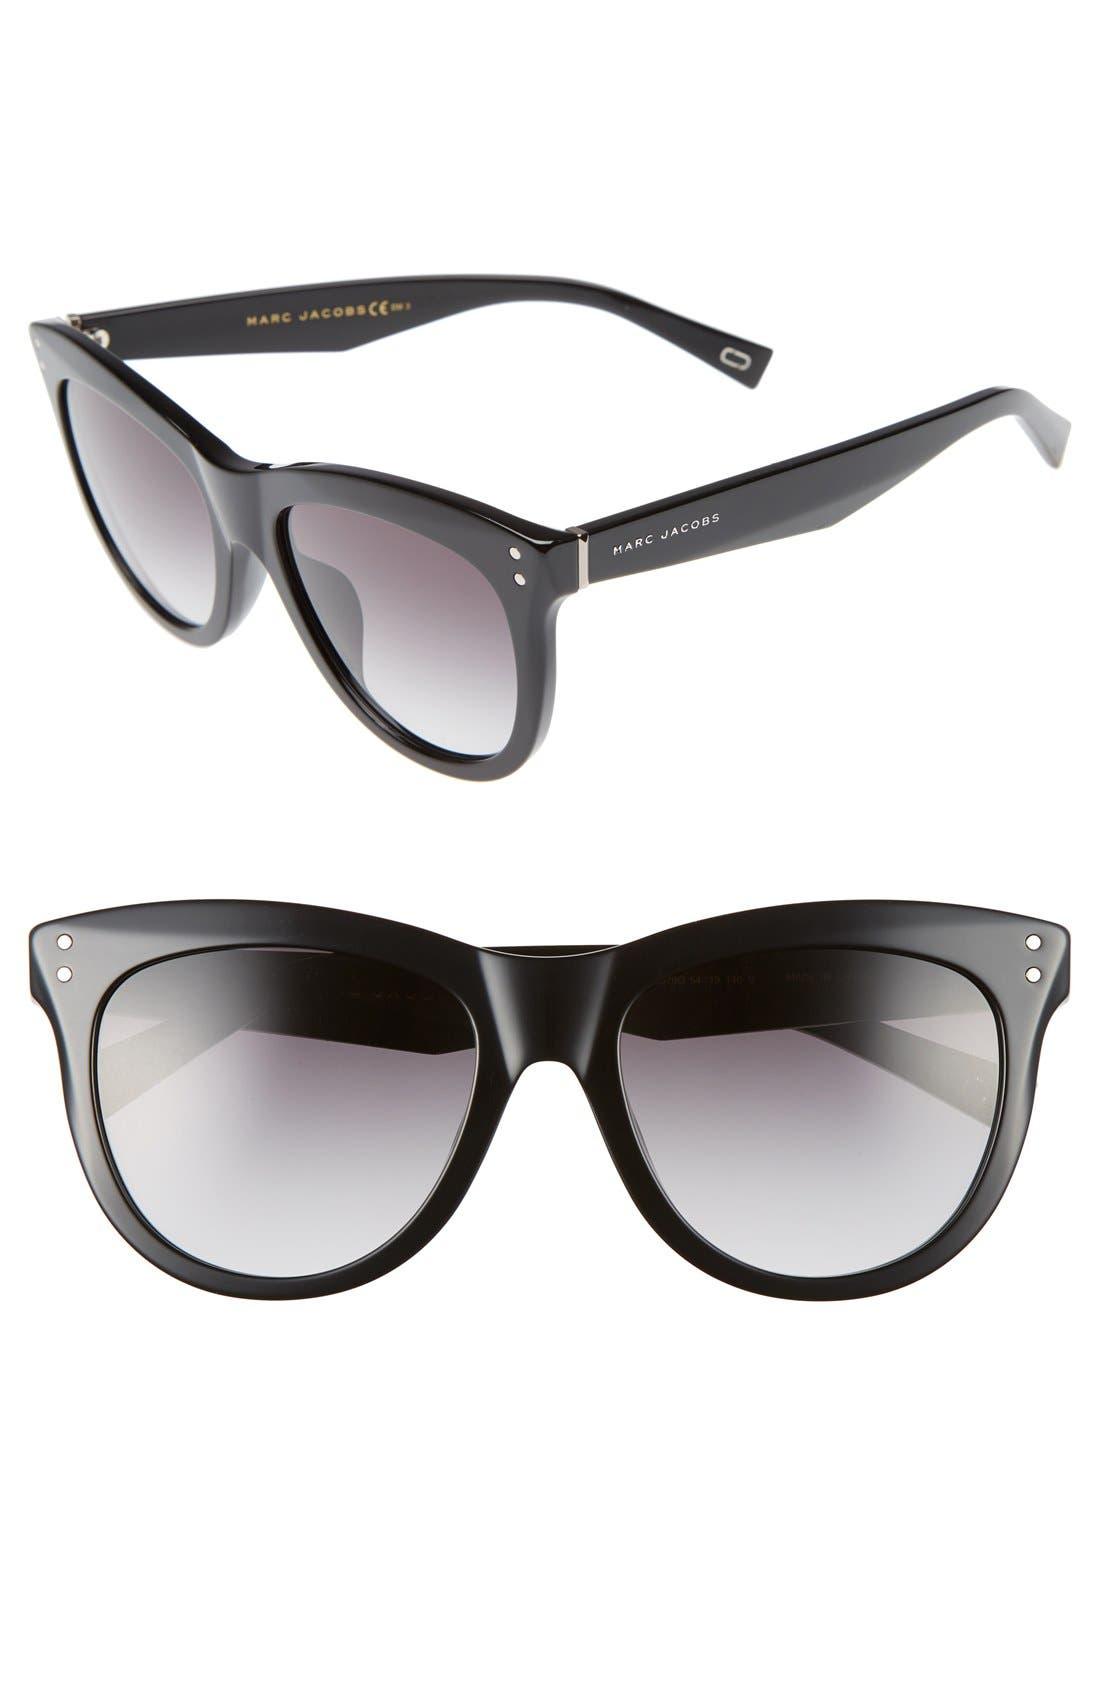 Main Image - MARC JACOBS 54mm Sunglasses